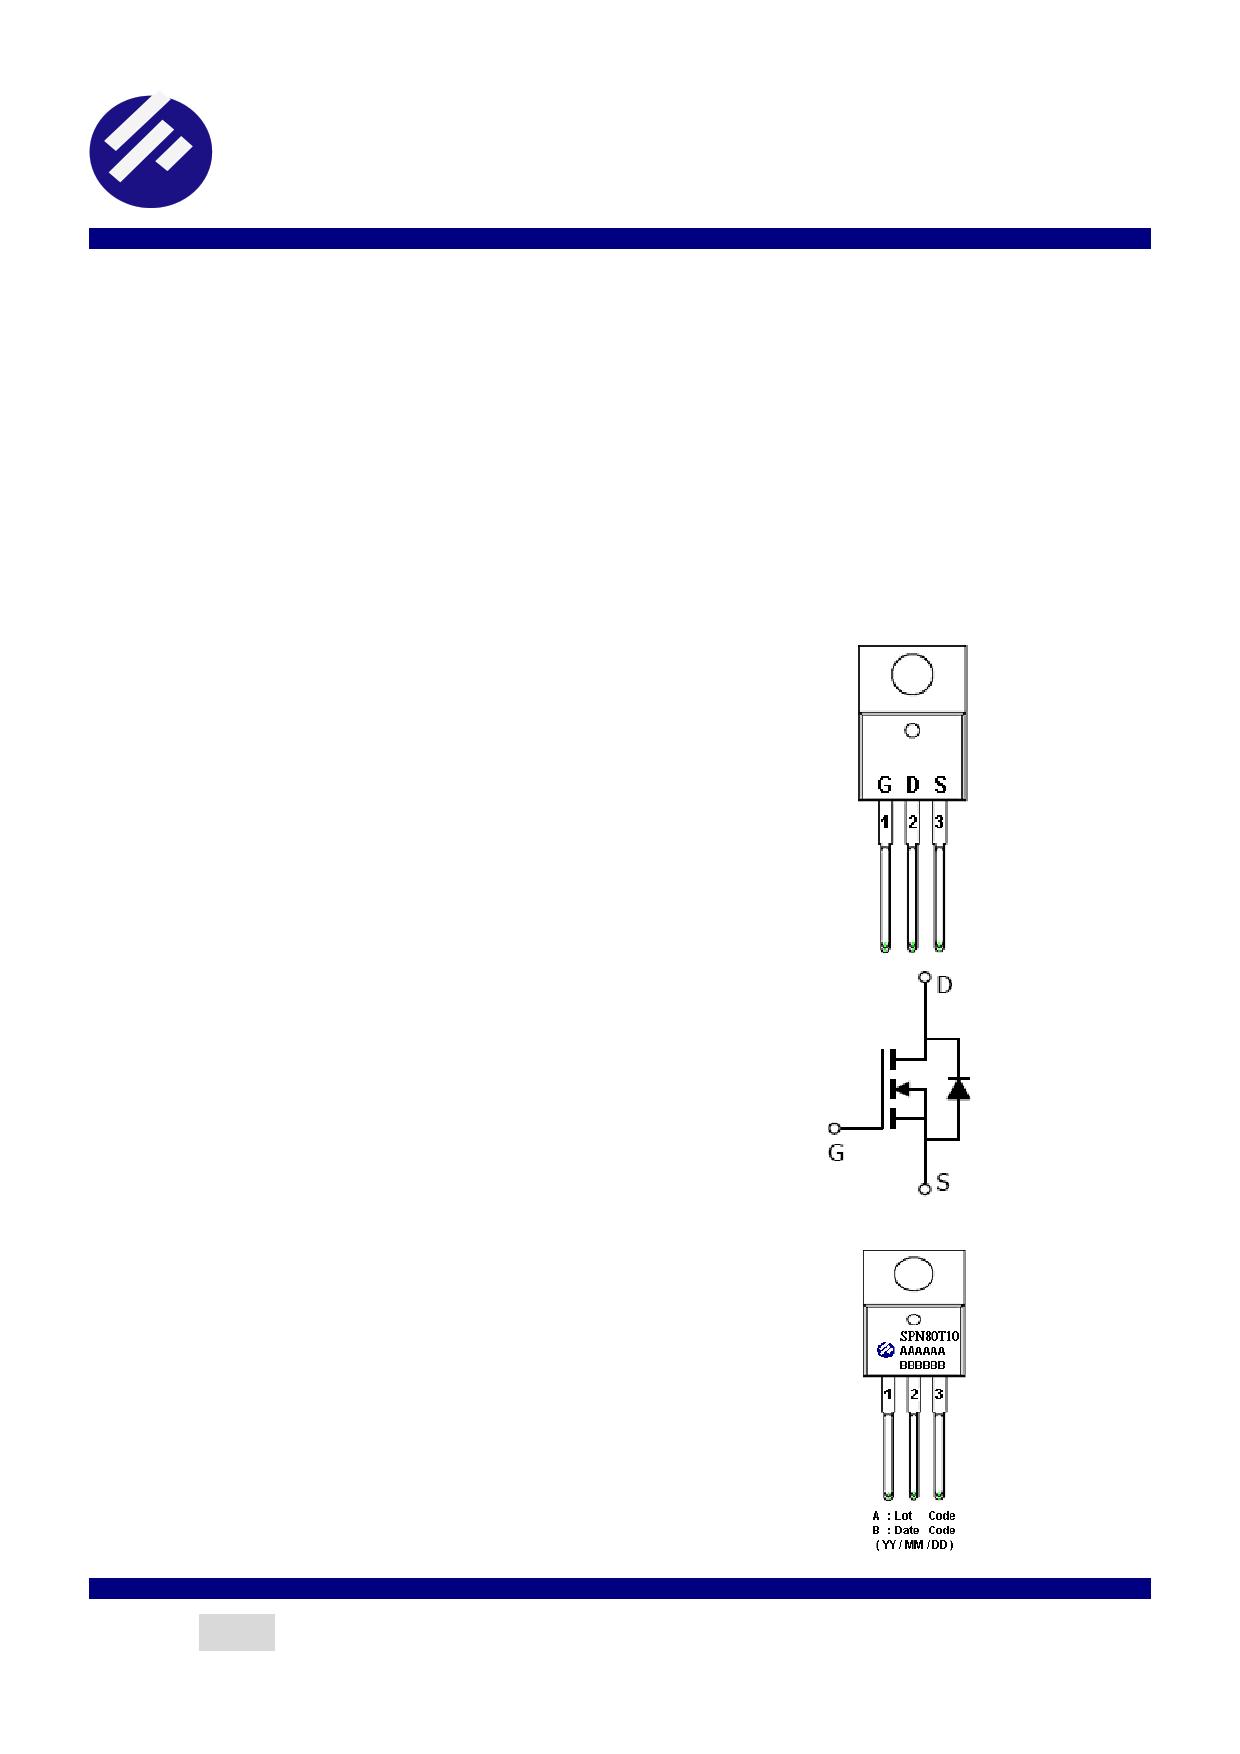 SPN80T10 데이터시트 및 SPN80T10 PDF